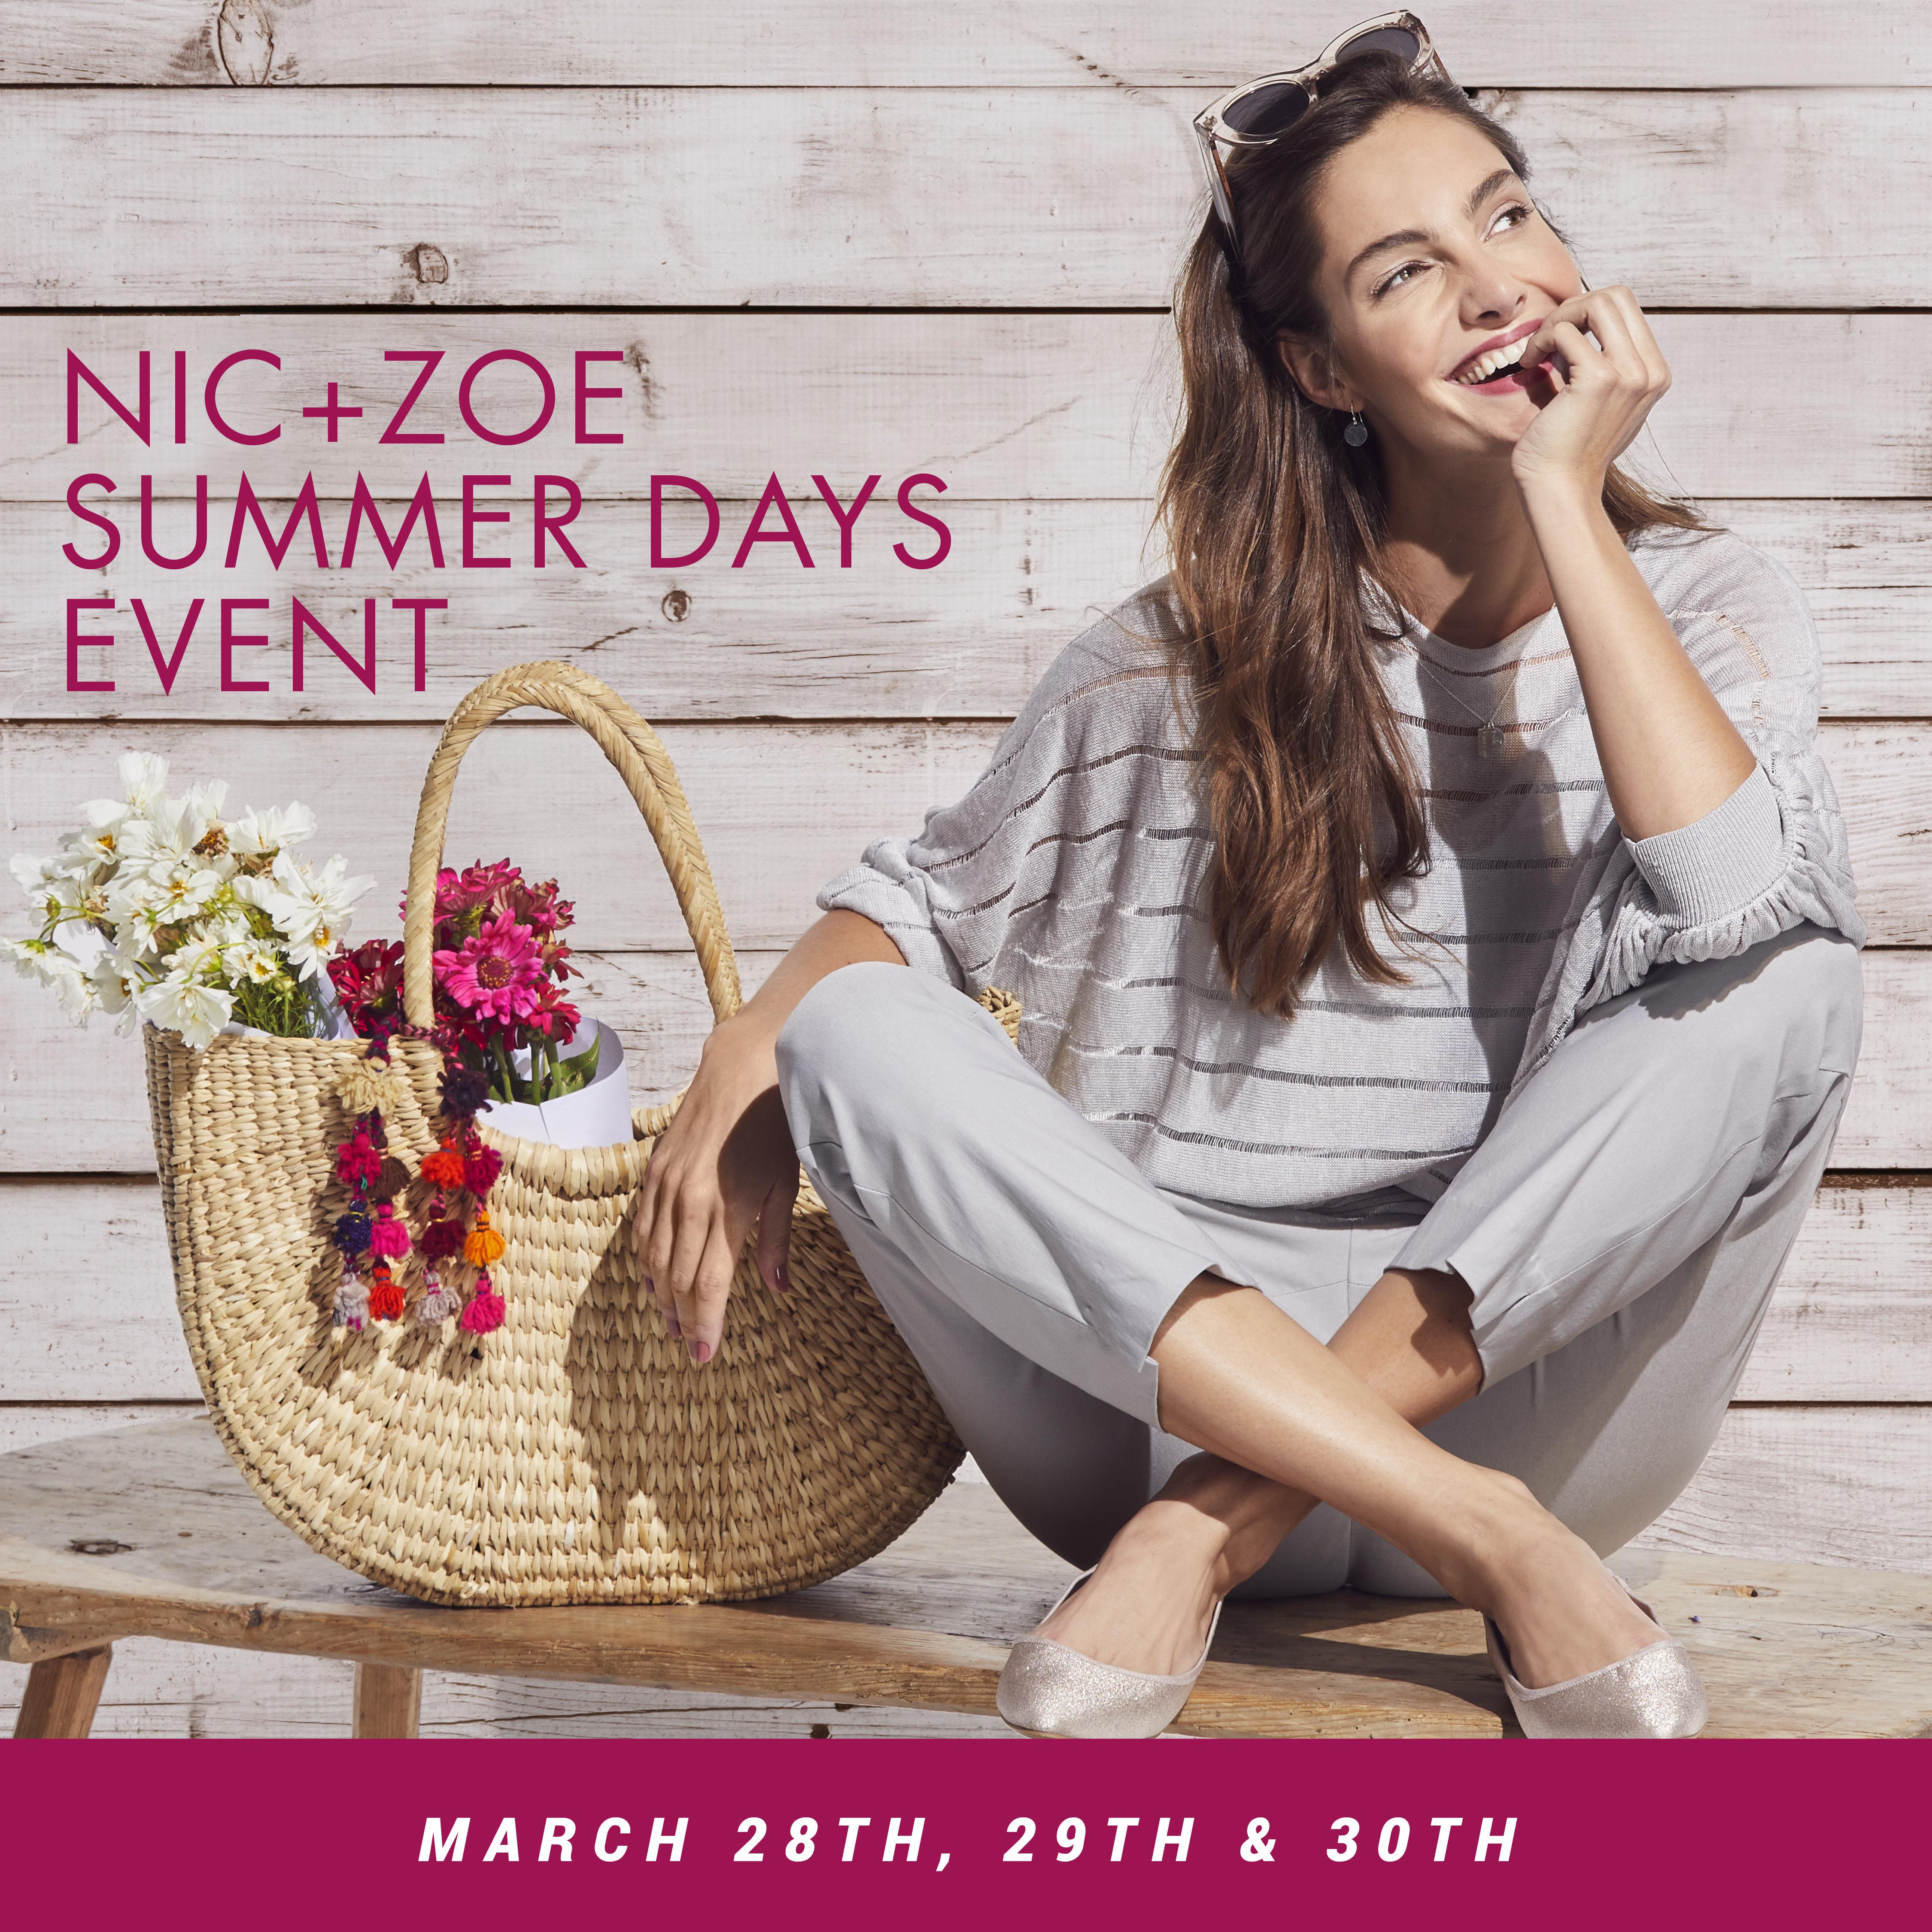 NIC + ZOE Summer Days Event